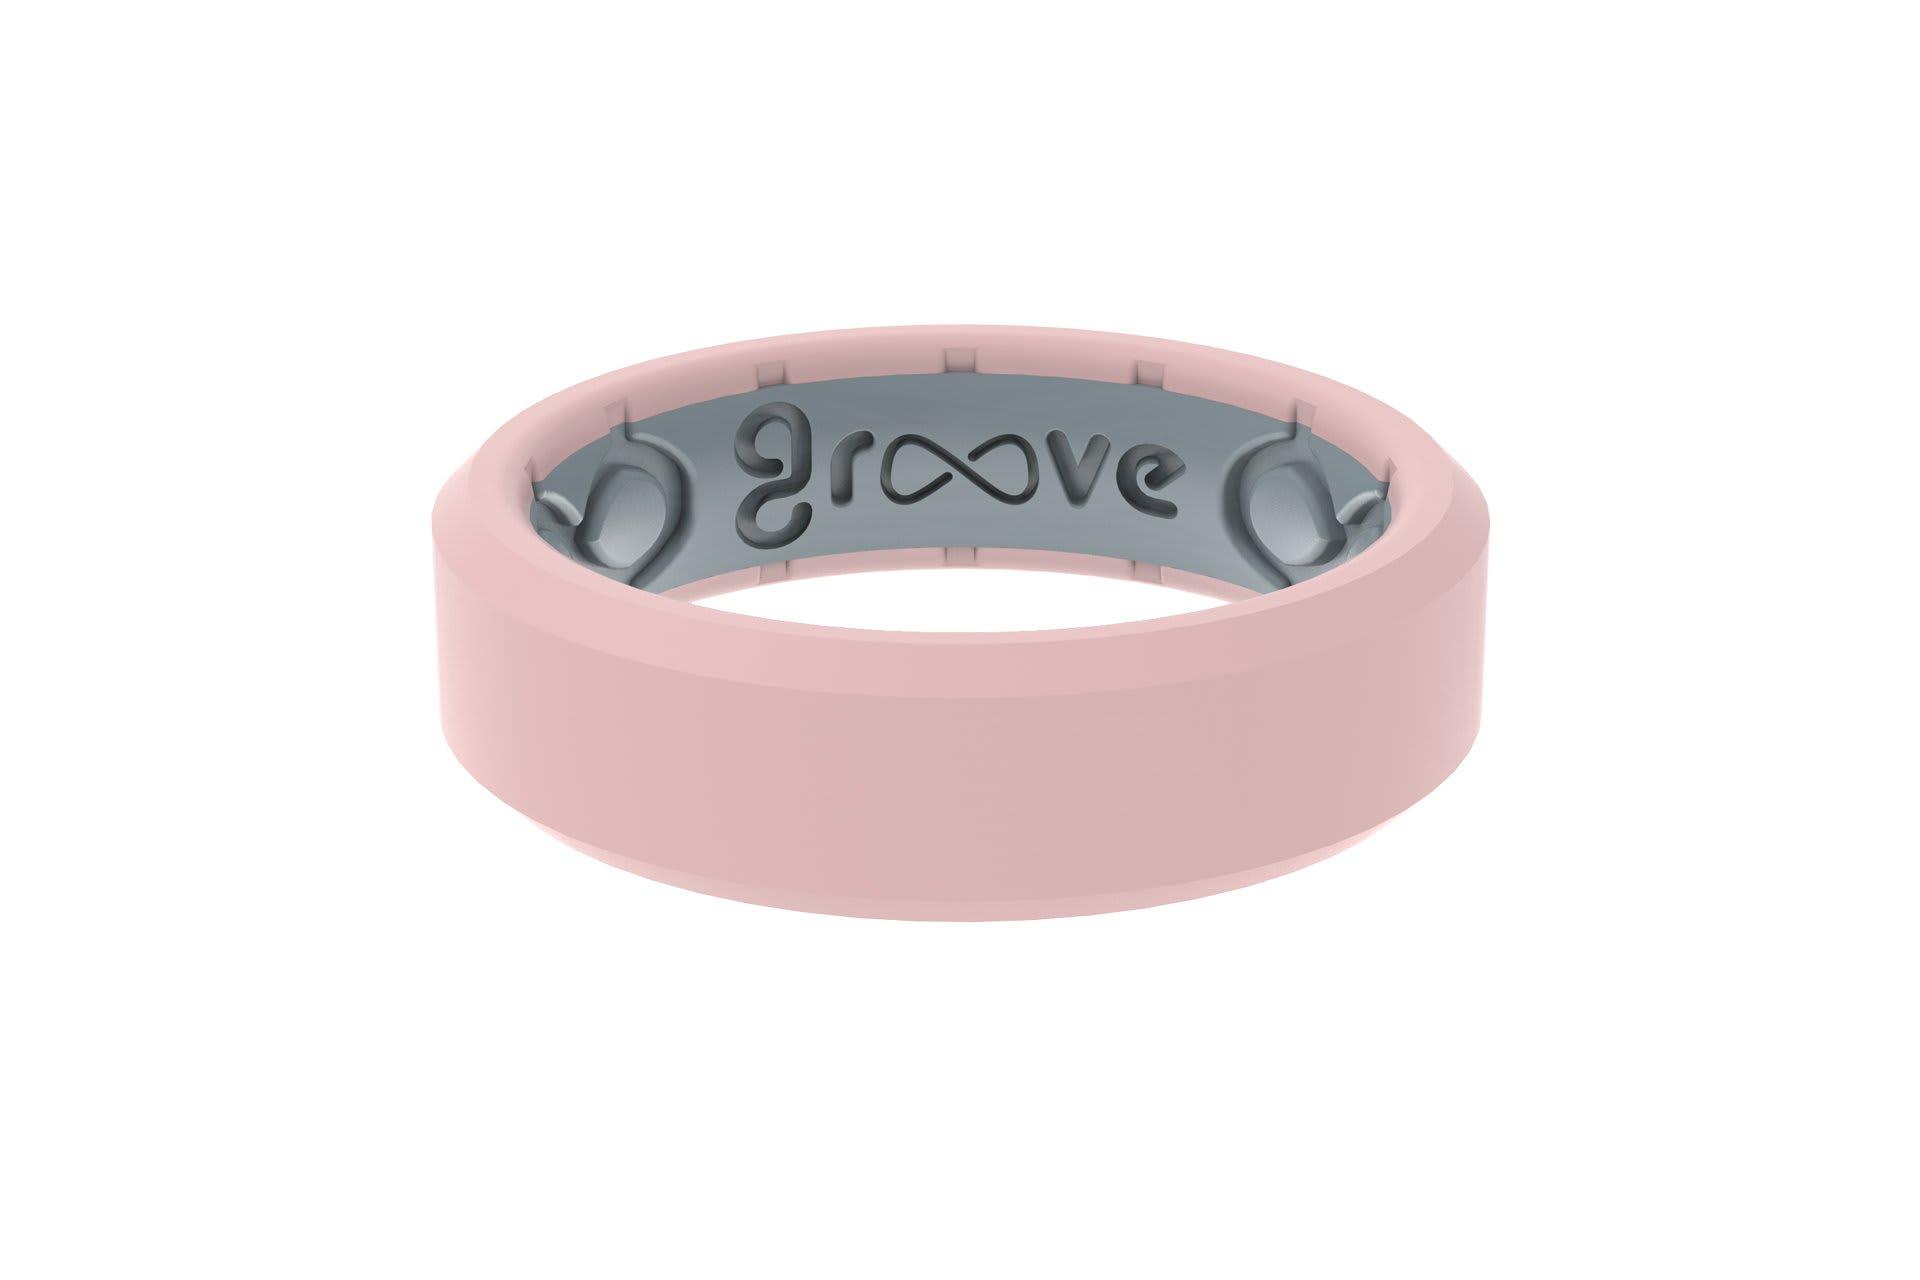 Edge Thin Rose Quartz - Groove Life Silicone Wedding Rings